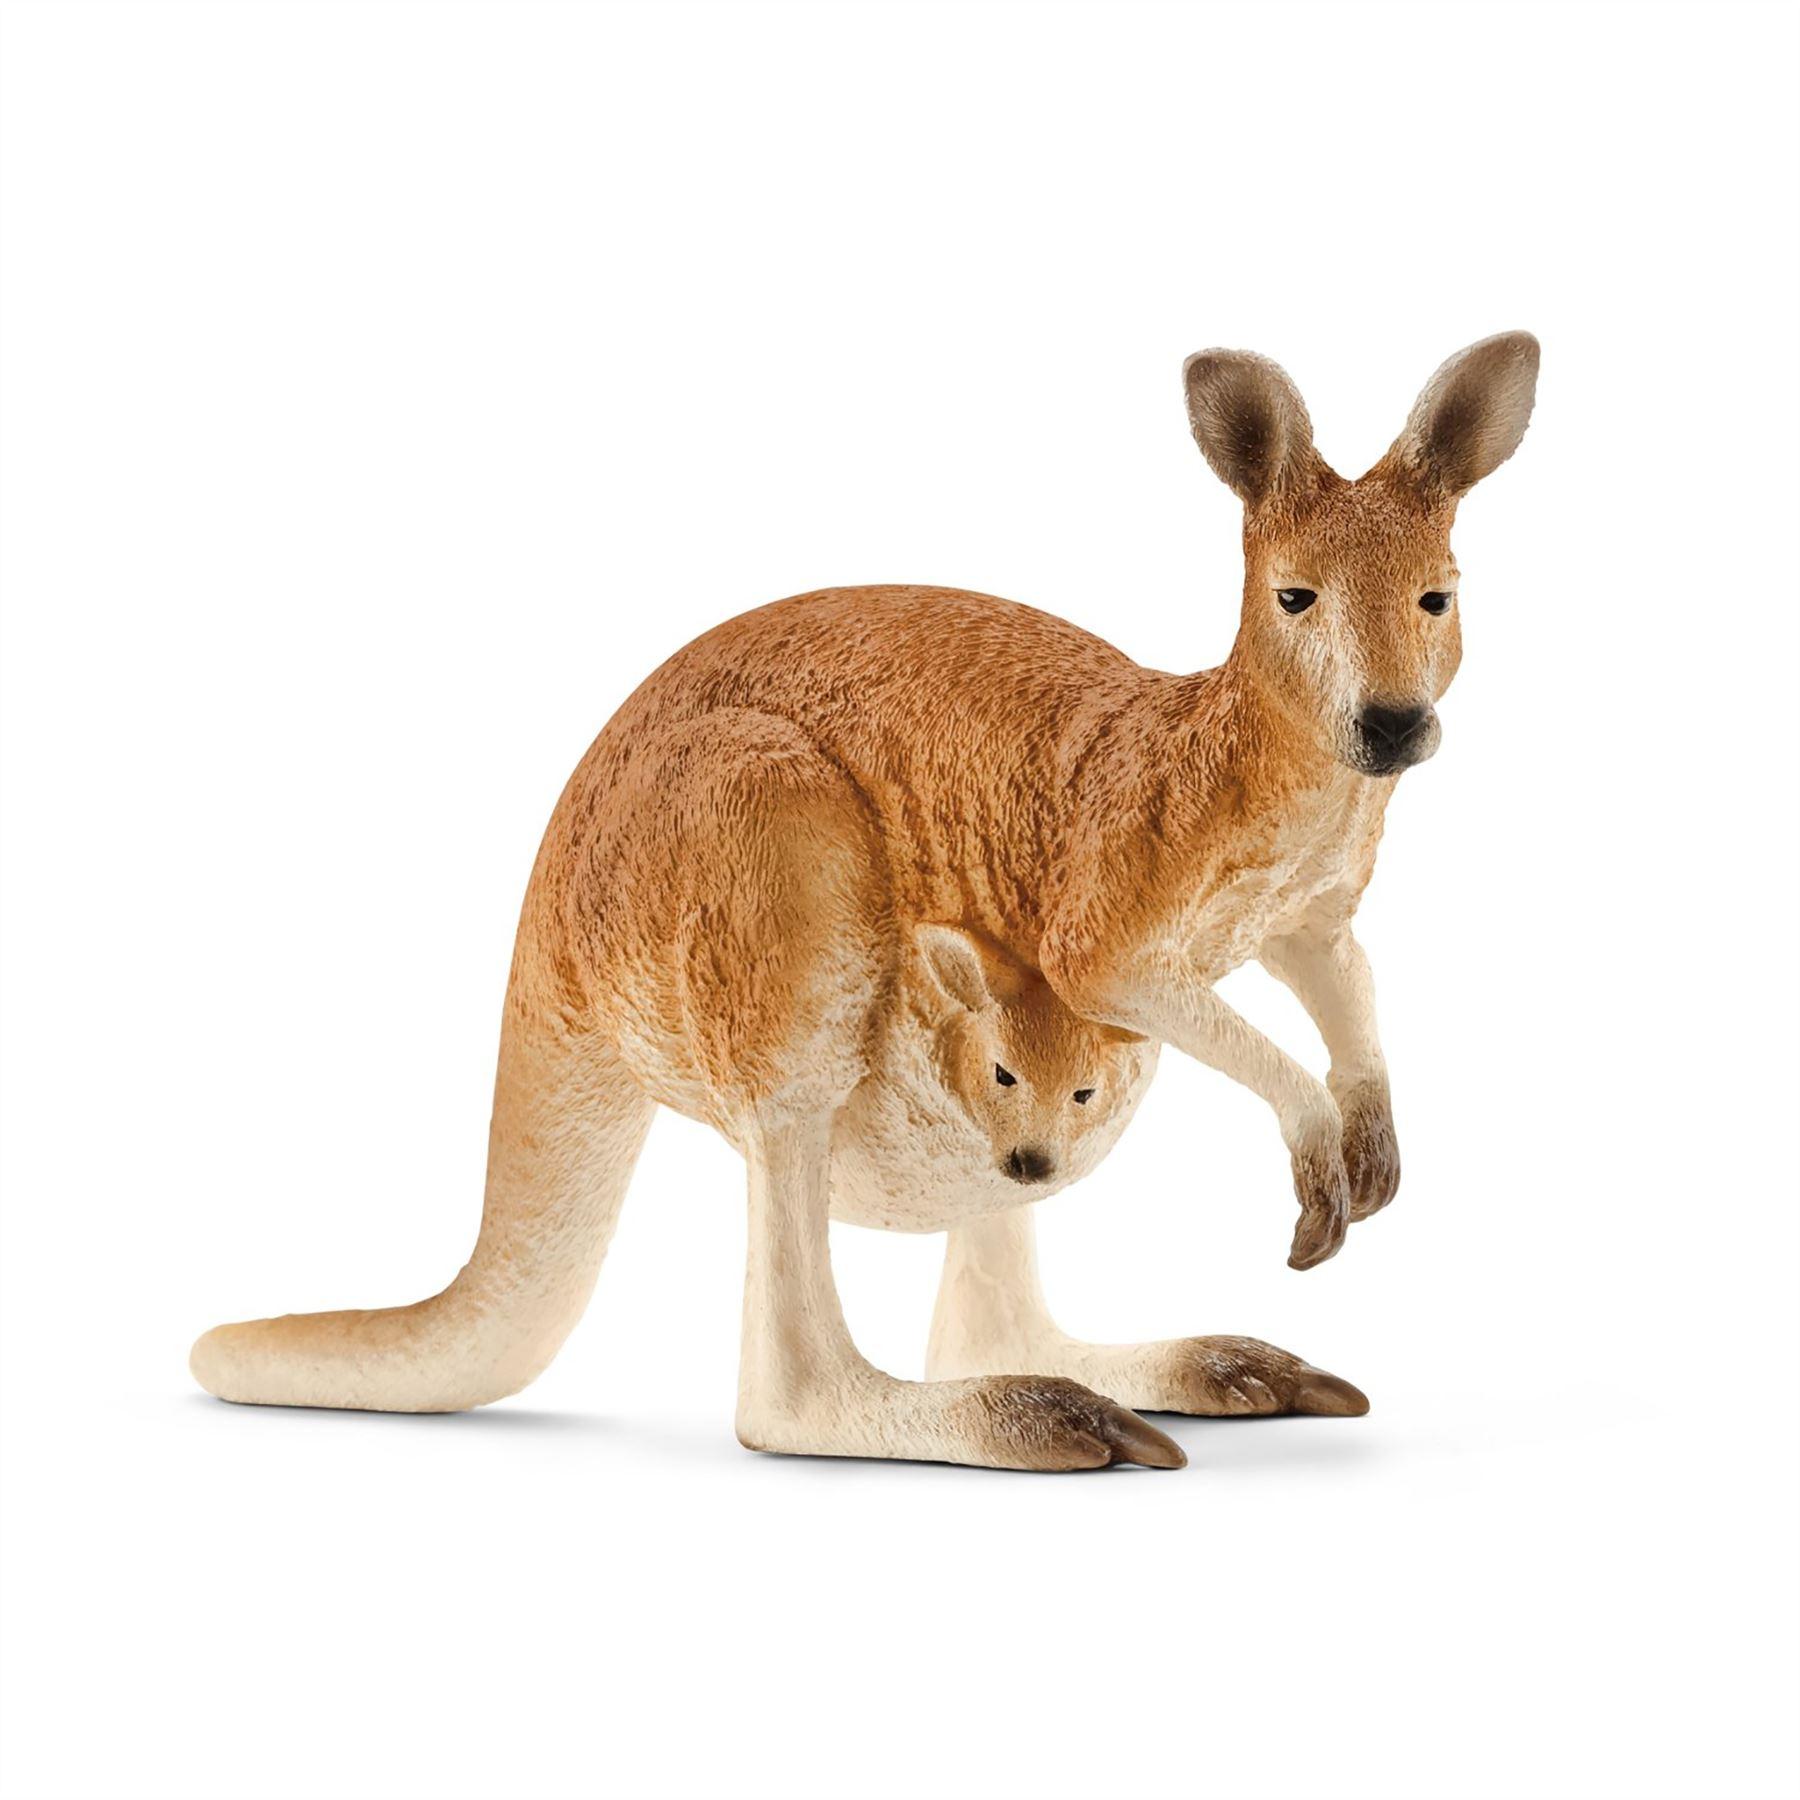 Schleich Canguro Pack Animales Zoo de Vida Silvestre Mar figuras de modelo de vida